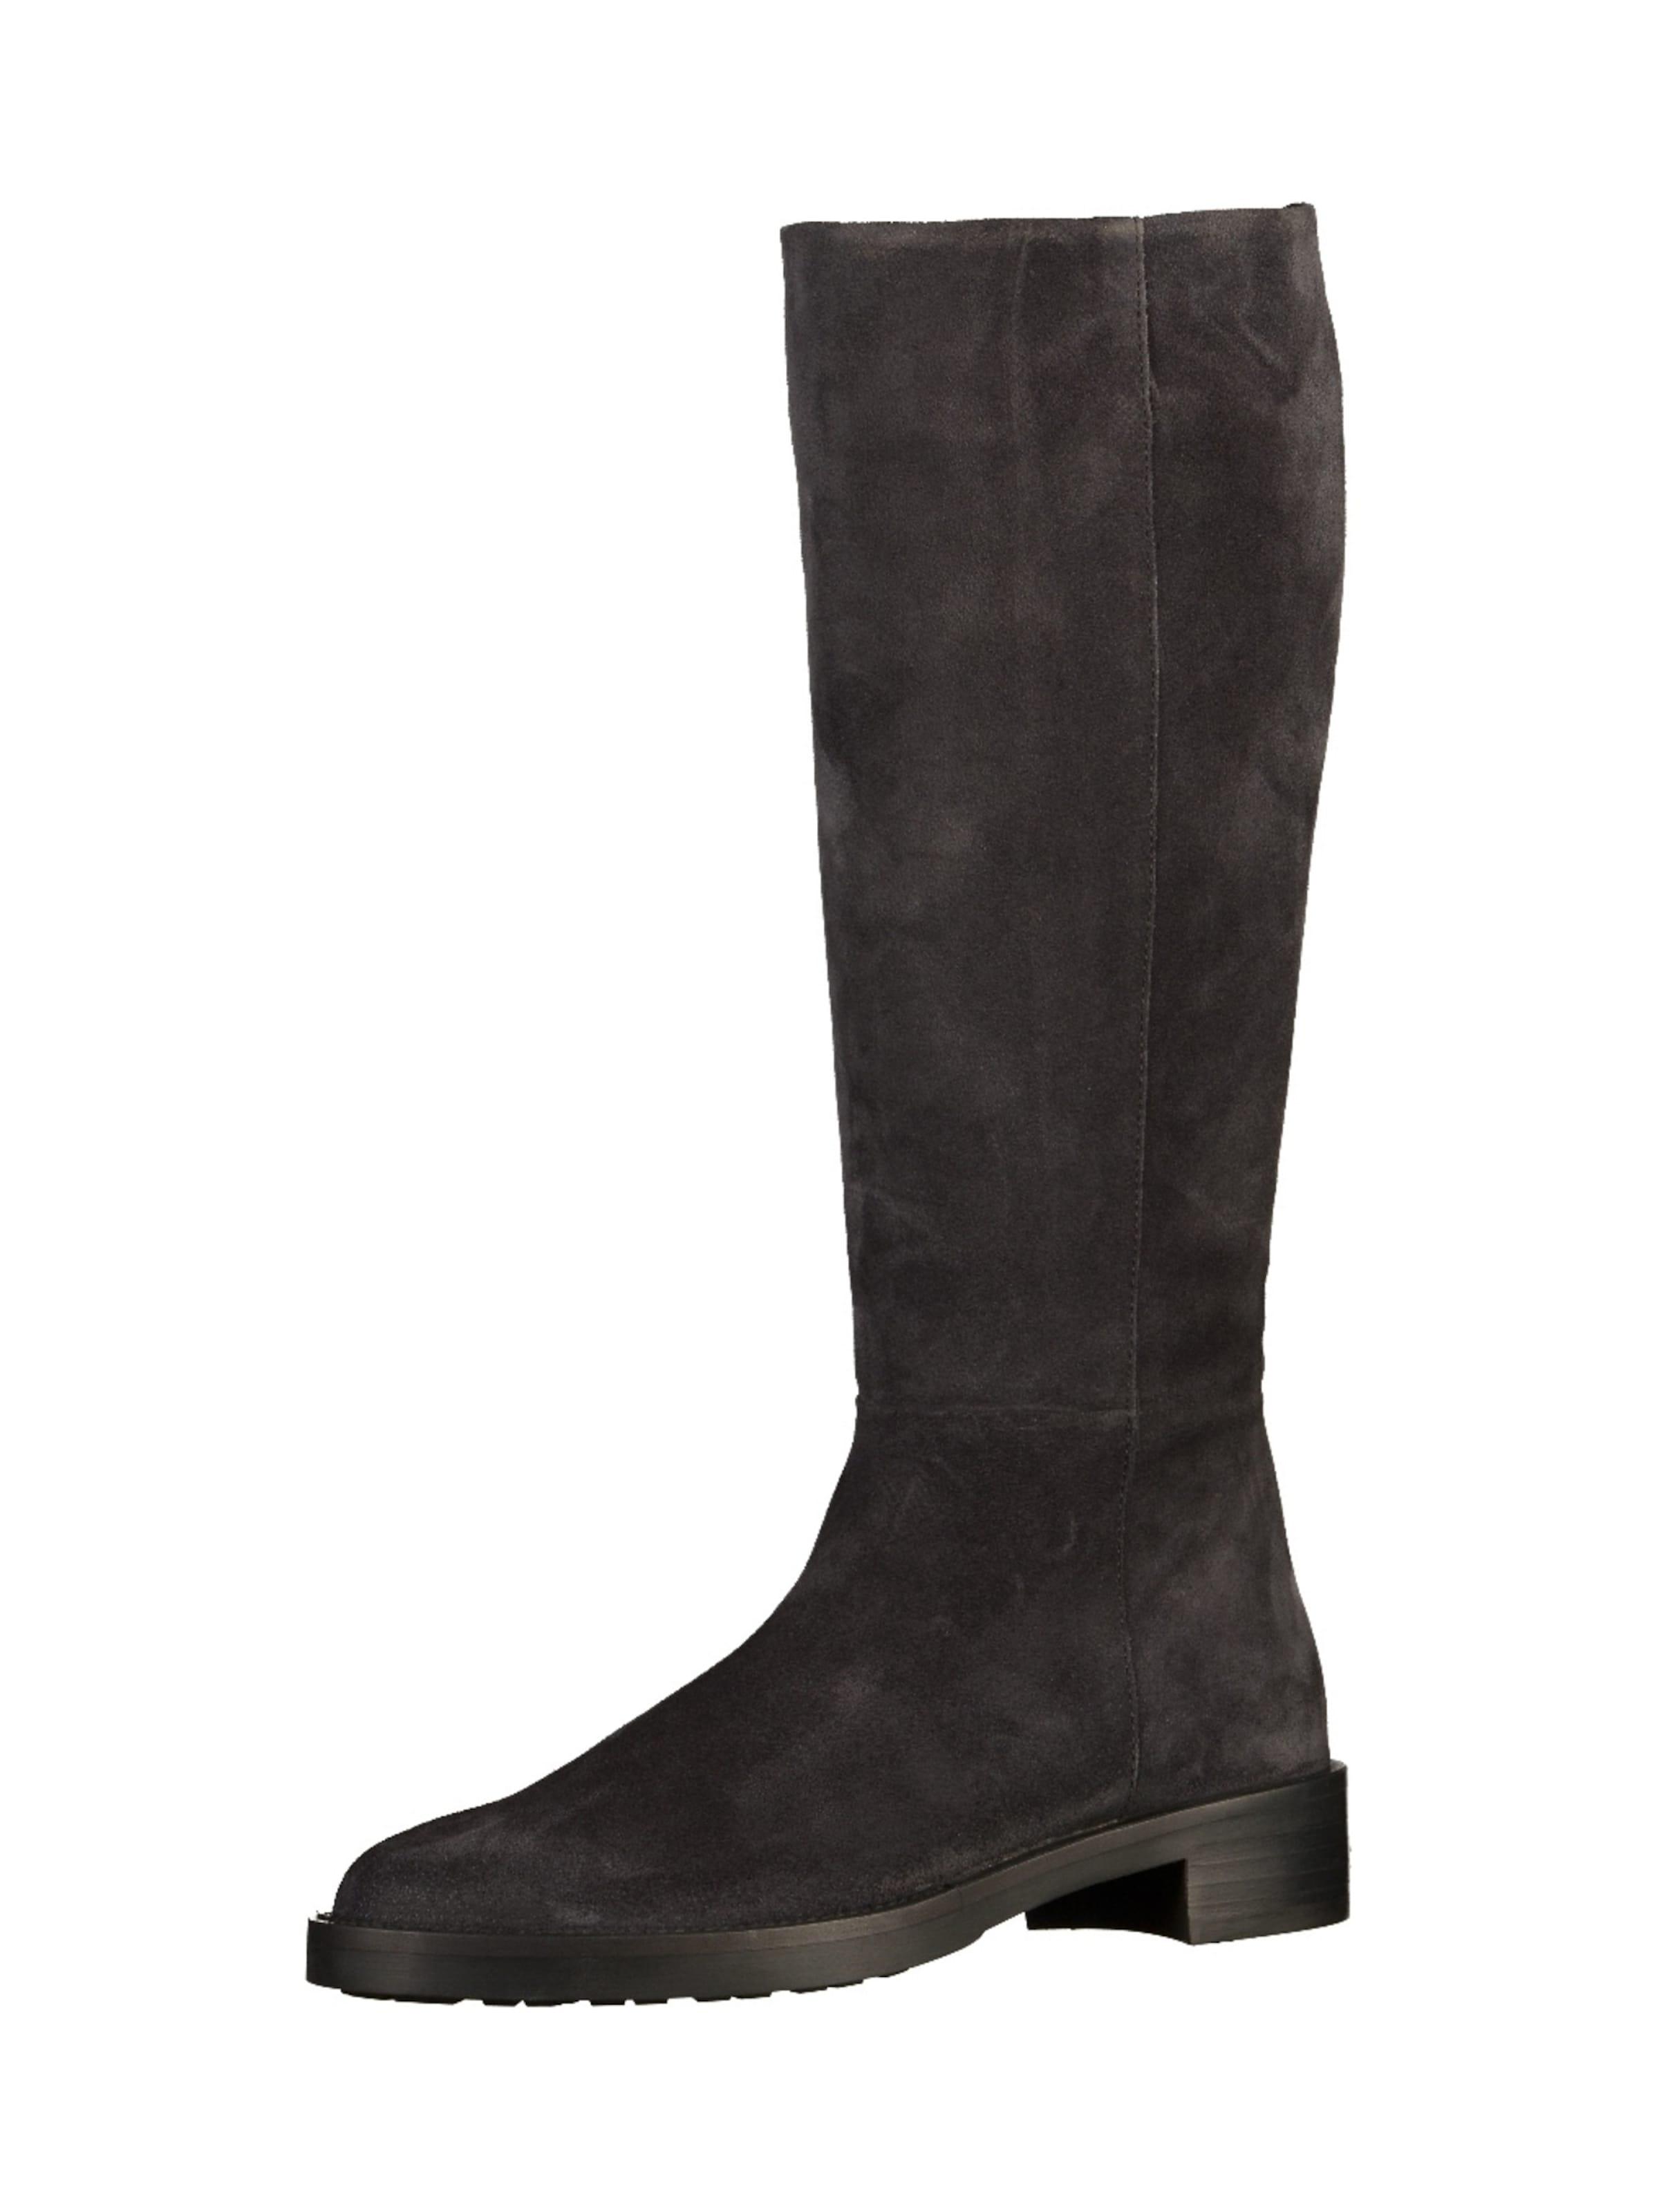 Haltbare Mode billige Schuhe Högl | Stiefel Schuhe Gut getragene Schuhe